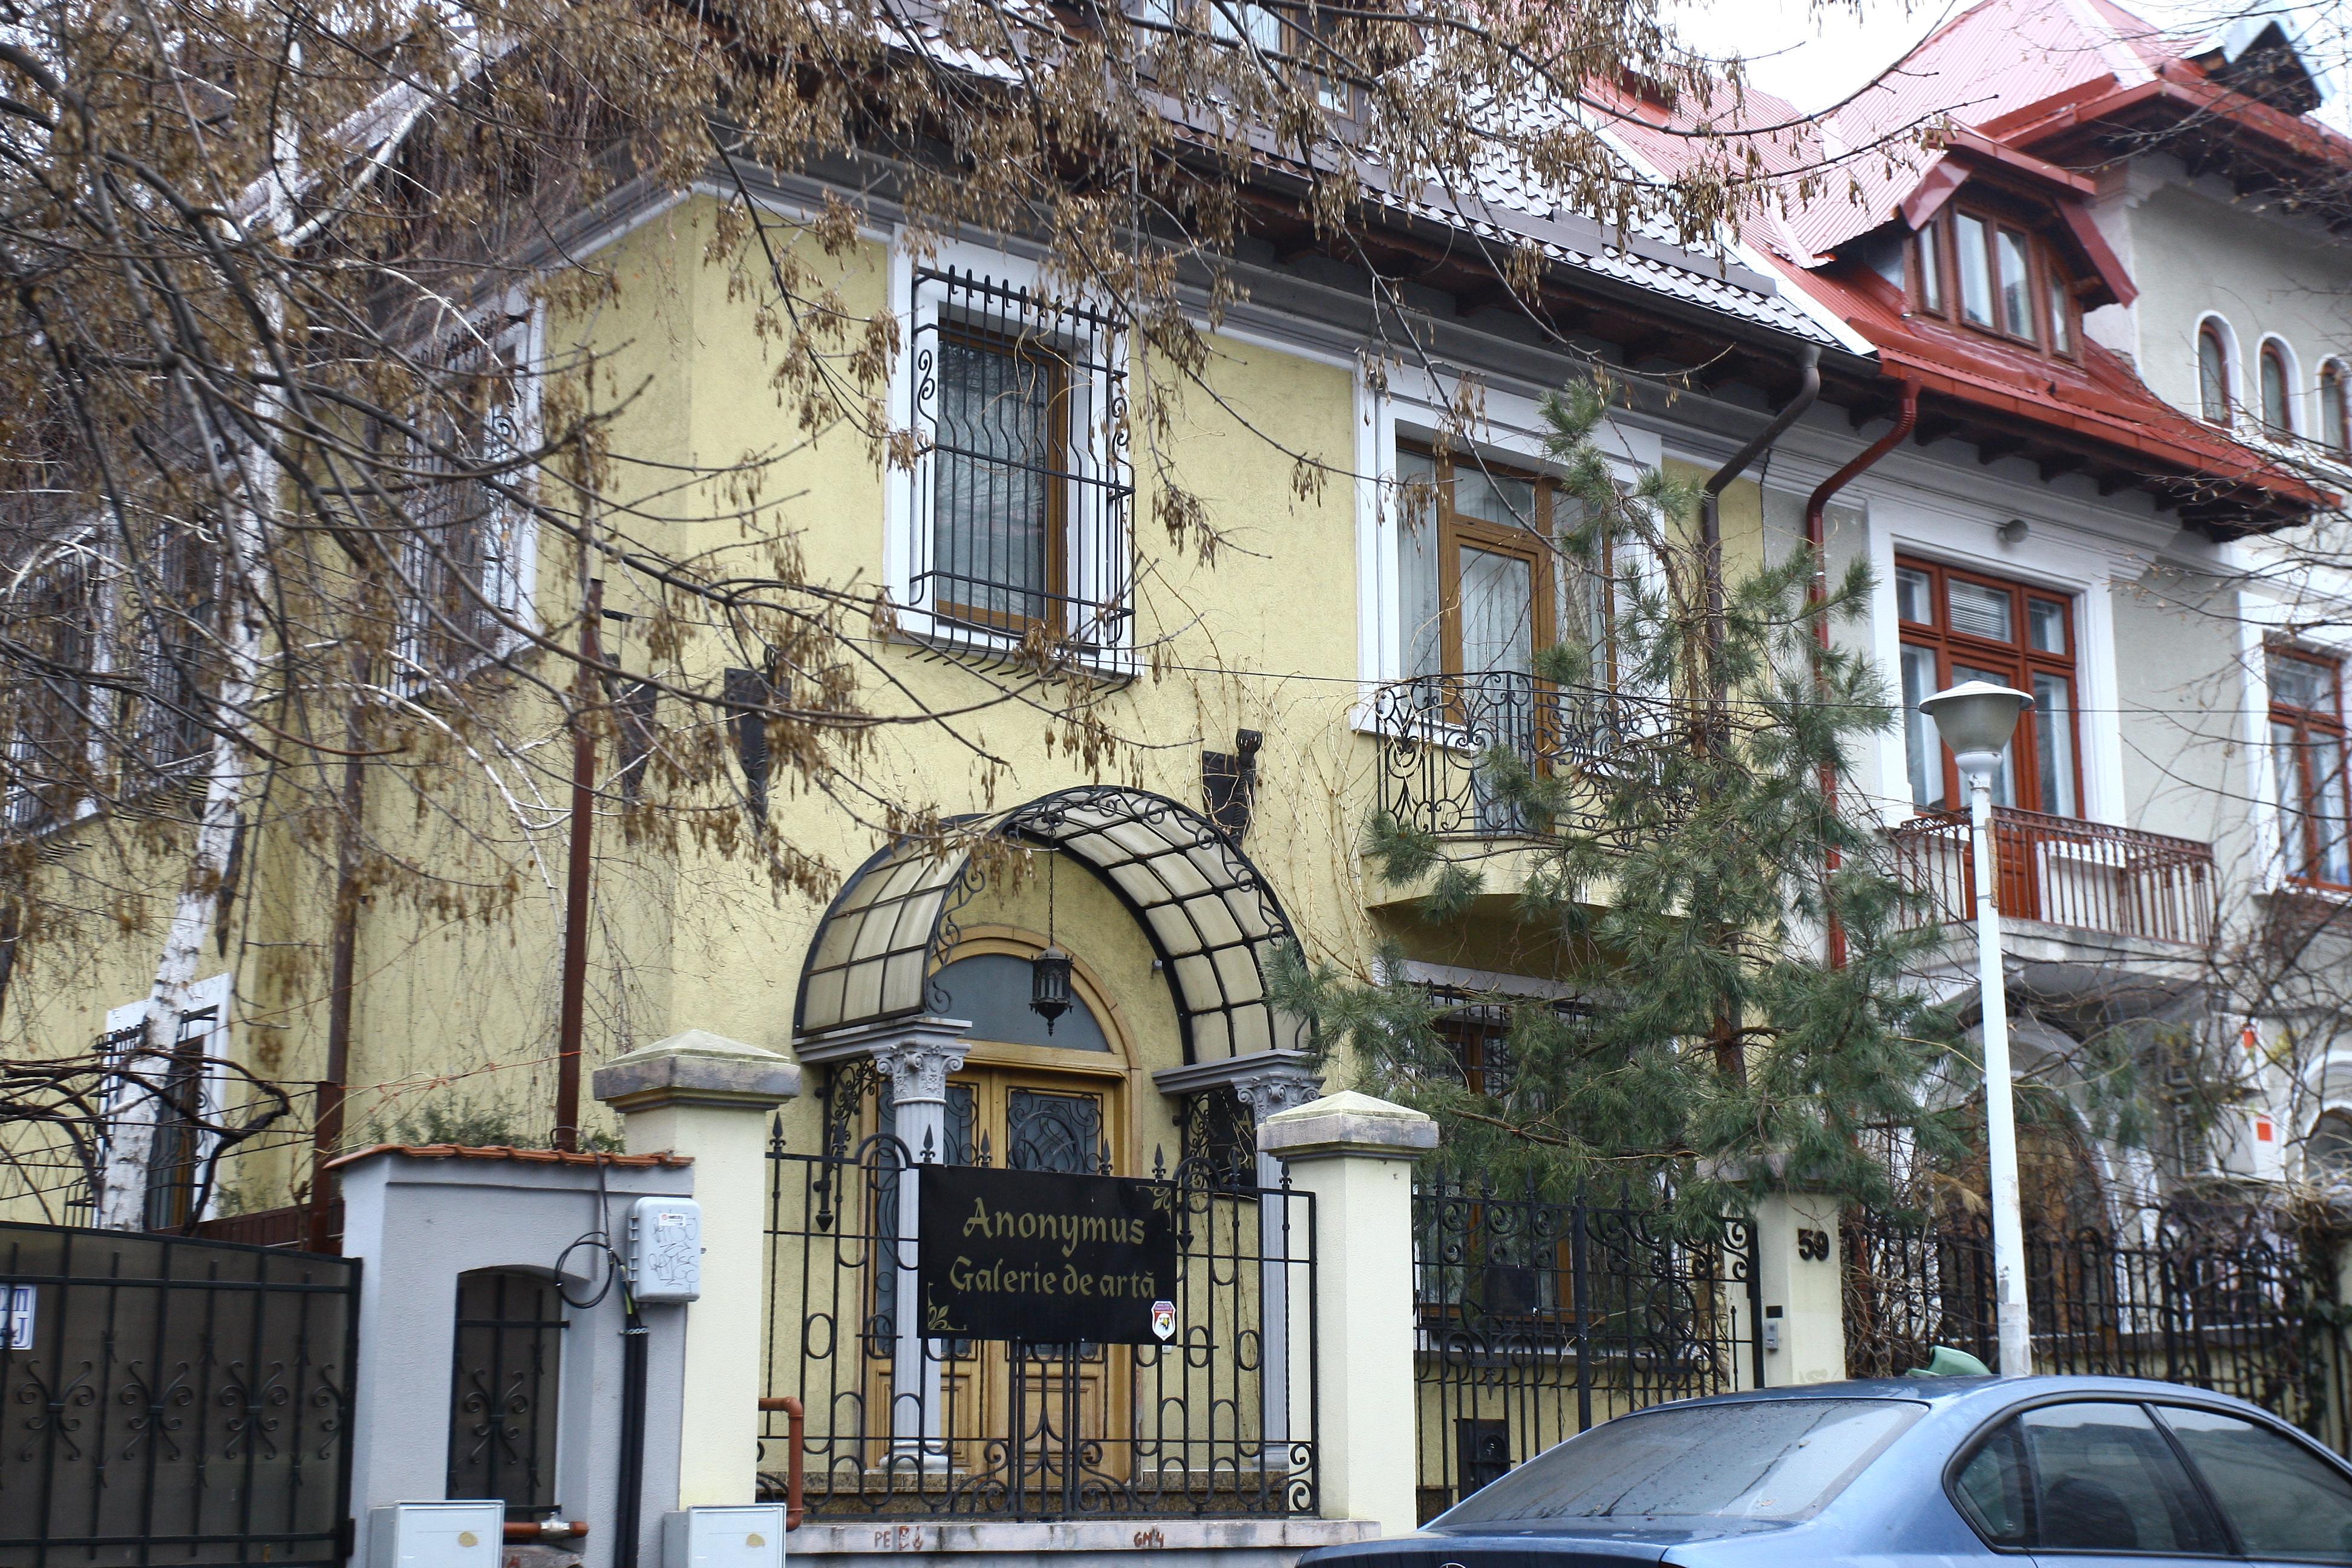 Casa in care azi functioneaza o galerie de arta a fost achizitionata, in 2003, de secretarul general adjunct al PSD contra sumei de 30.000 de dolari!